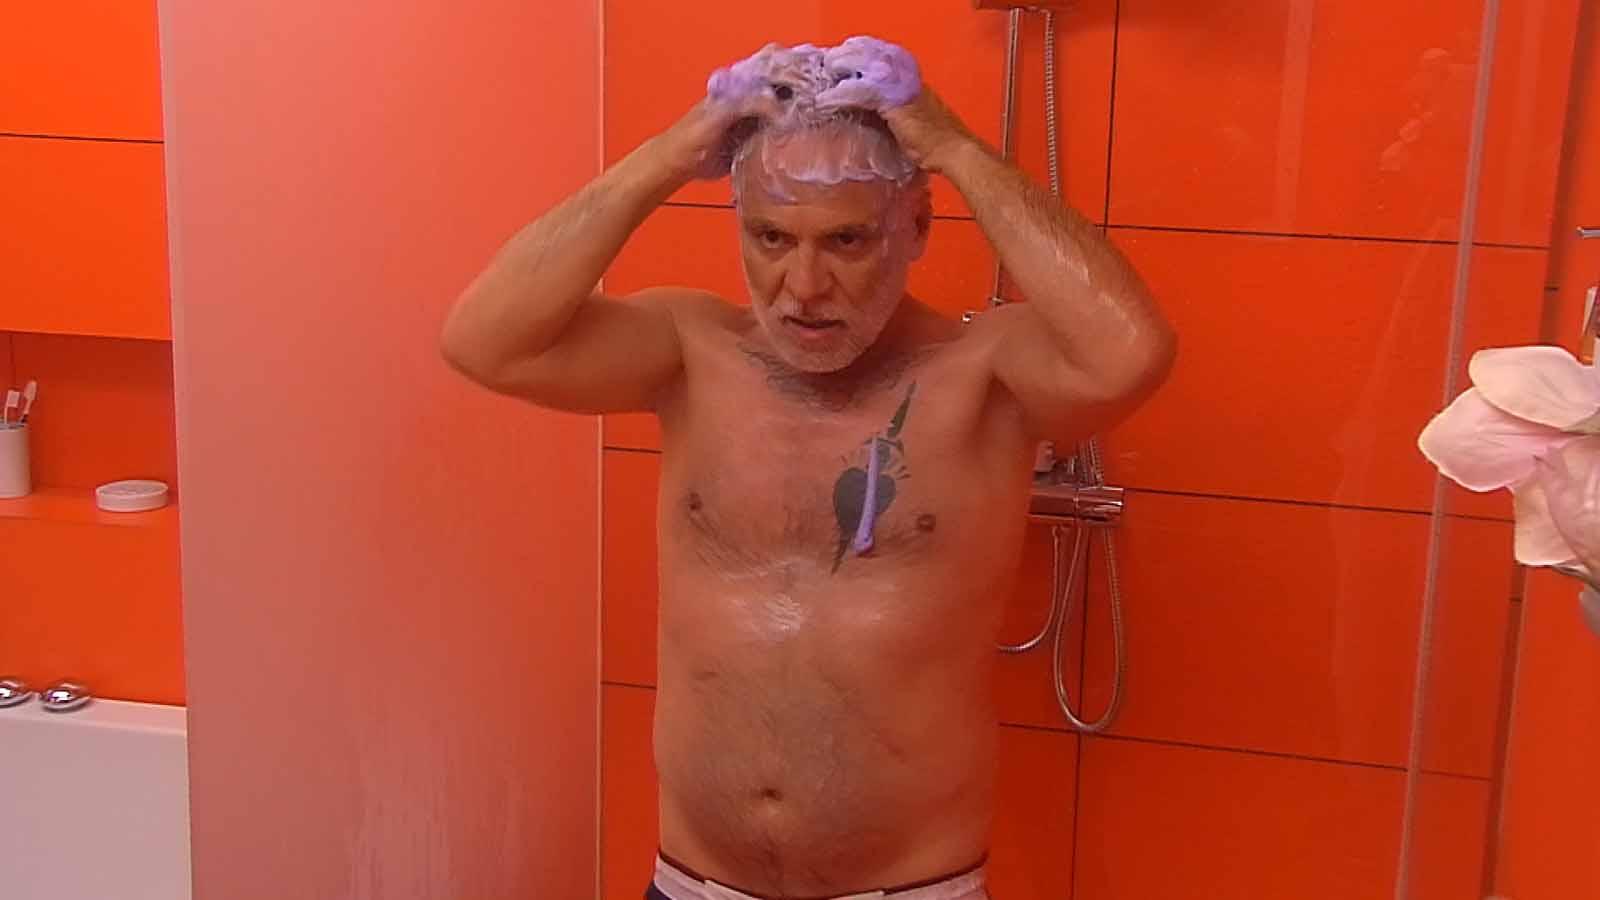 Promi Big Brother 2015: Wenn Playmates im Bikini duschen | TV